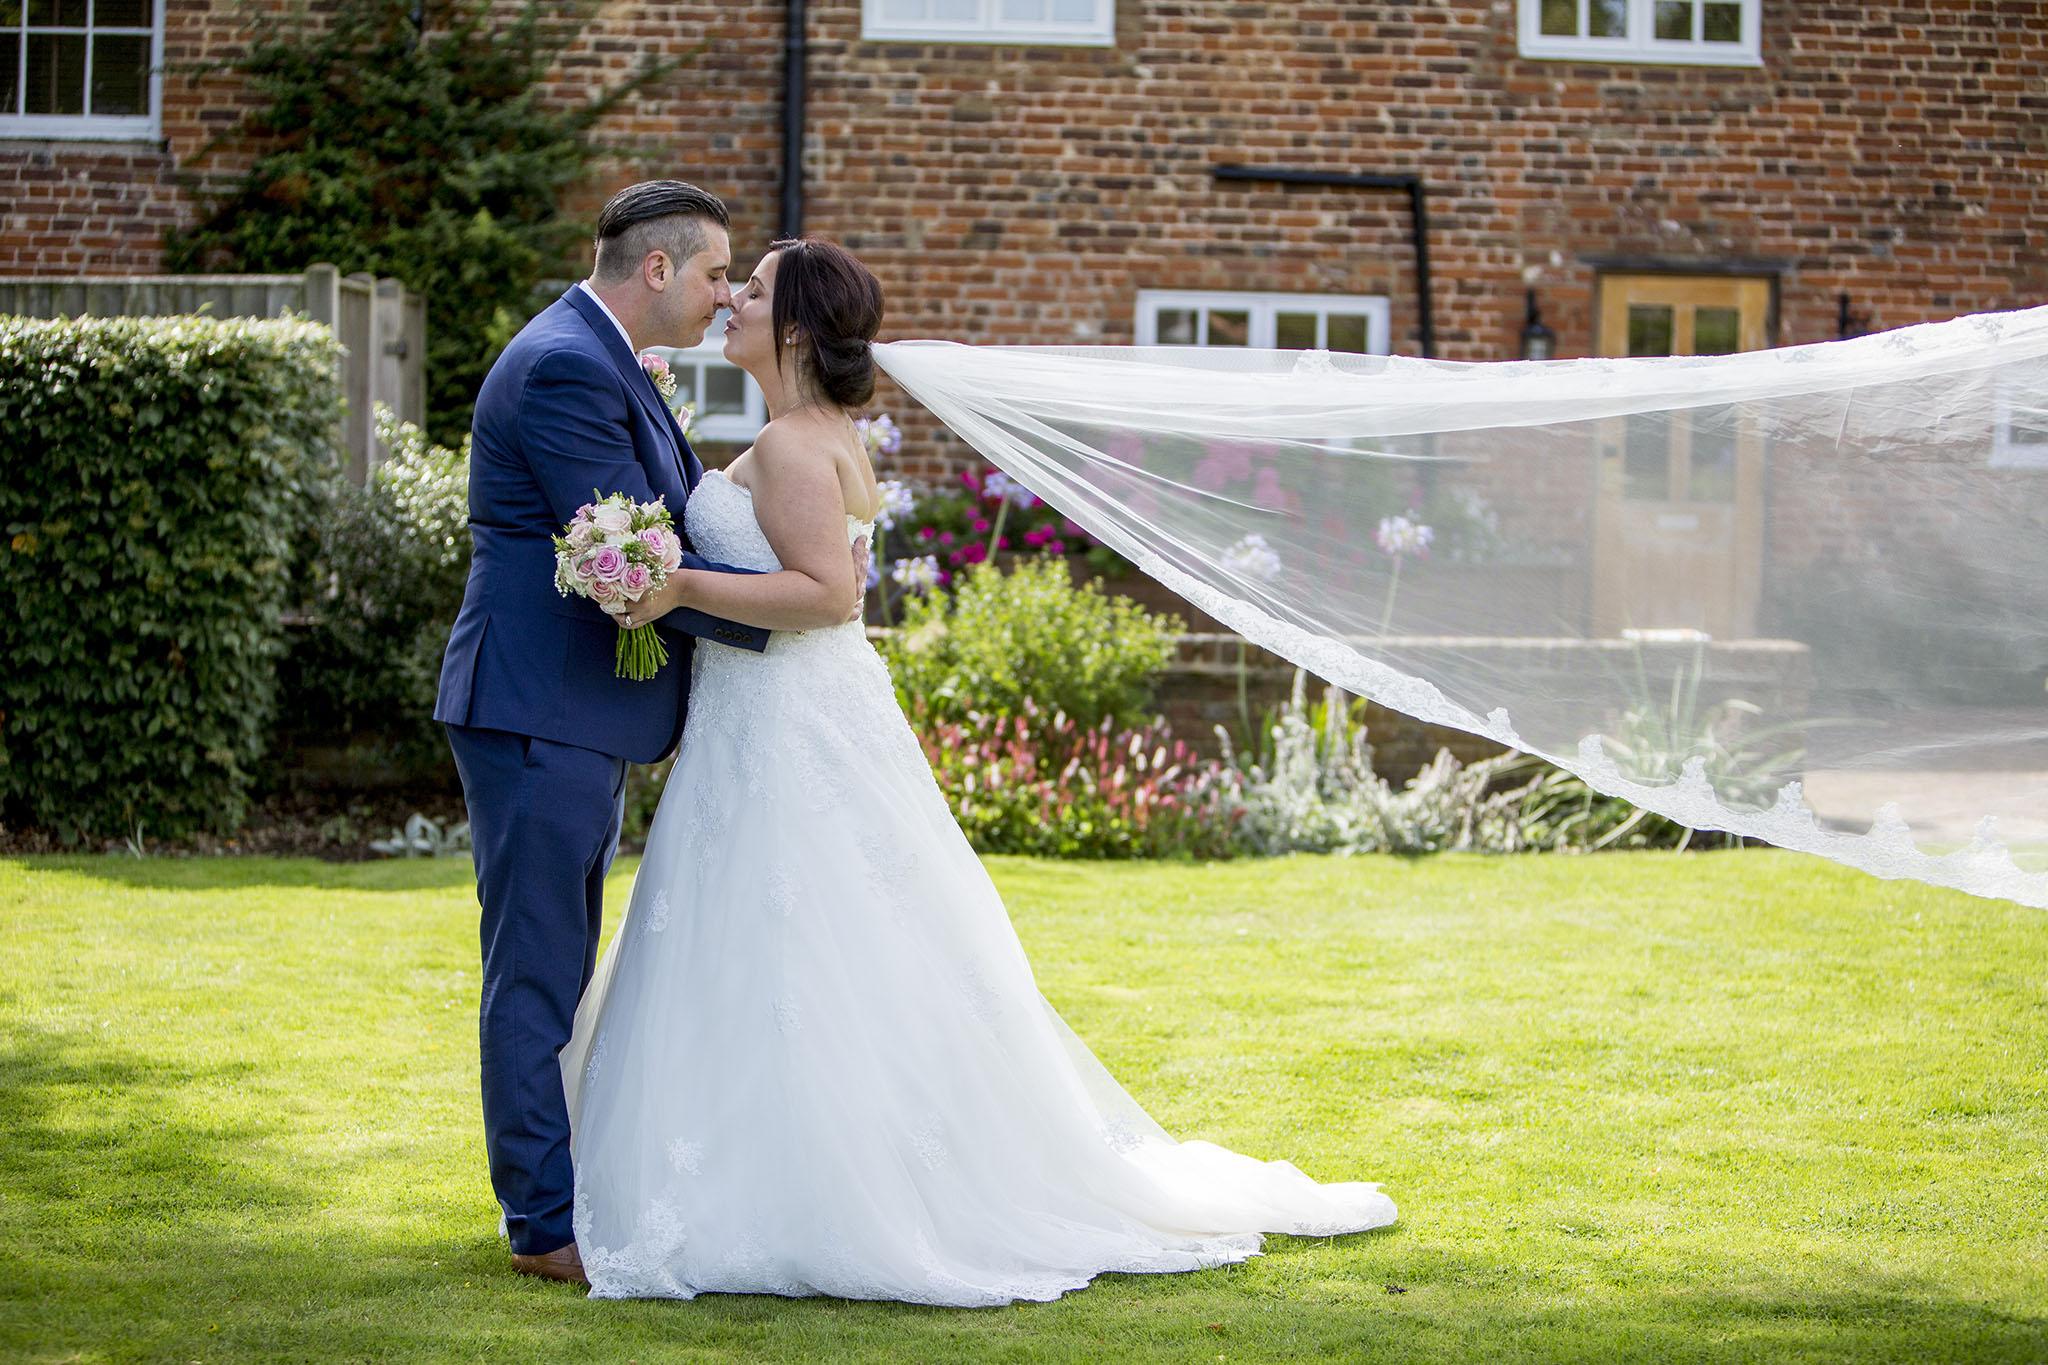 elizabethgphotography_kingslangley_hertfordshire_fineart_wedding_tewinbury_farm_tayna_22.jpg